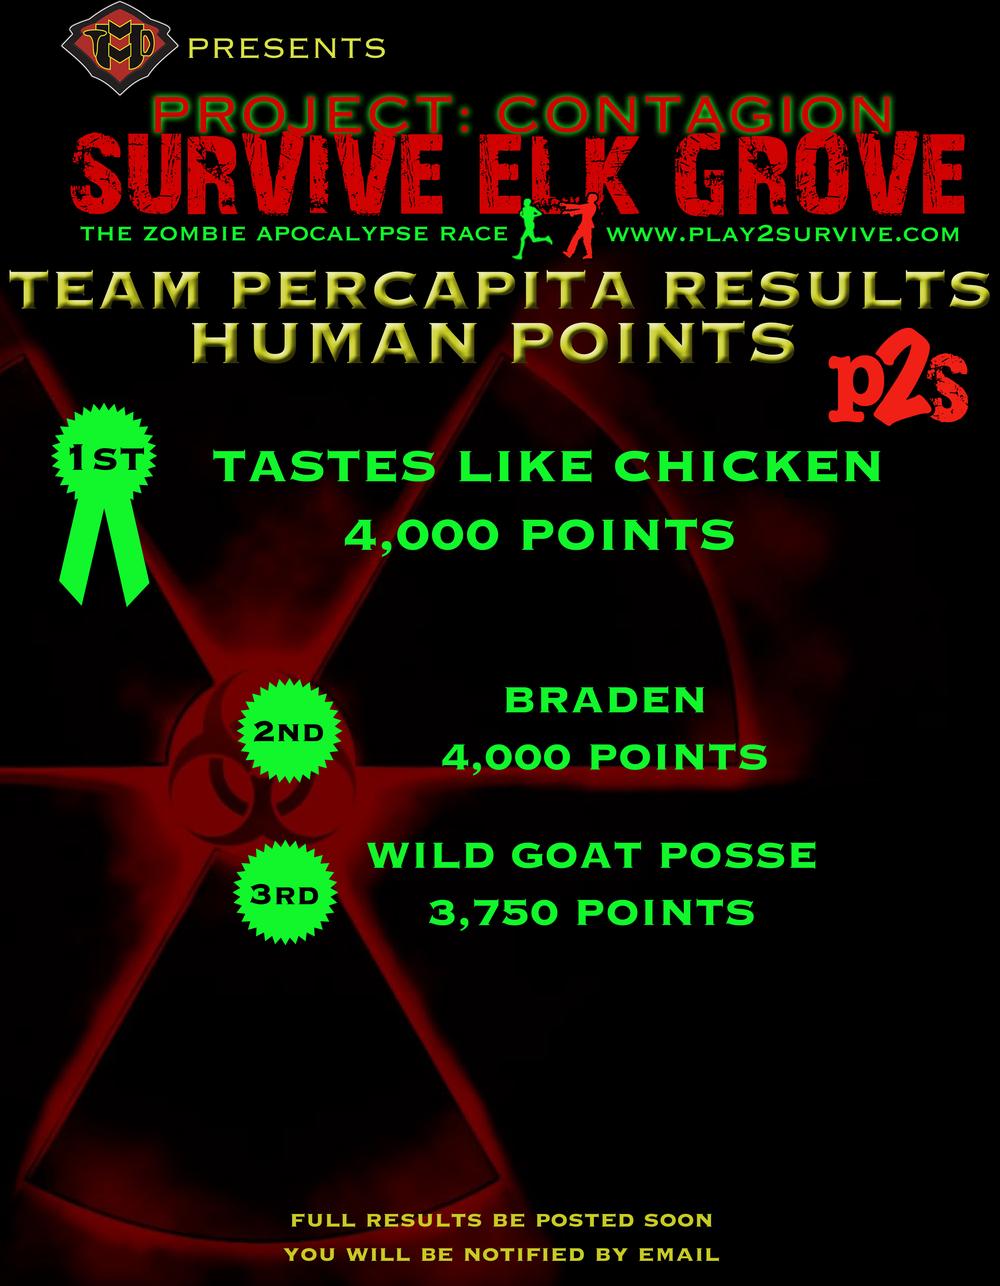 EG human team percapita results.jpg